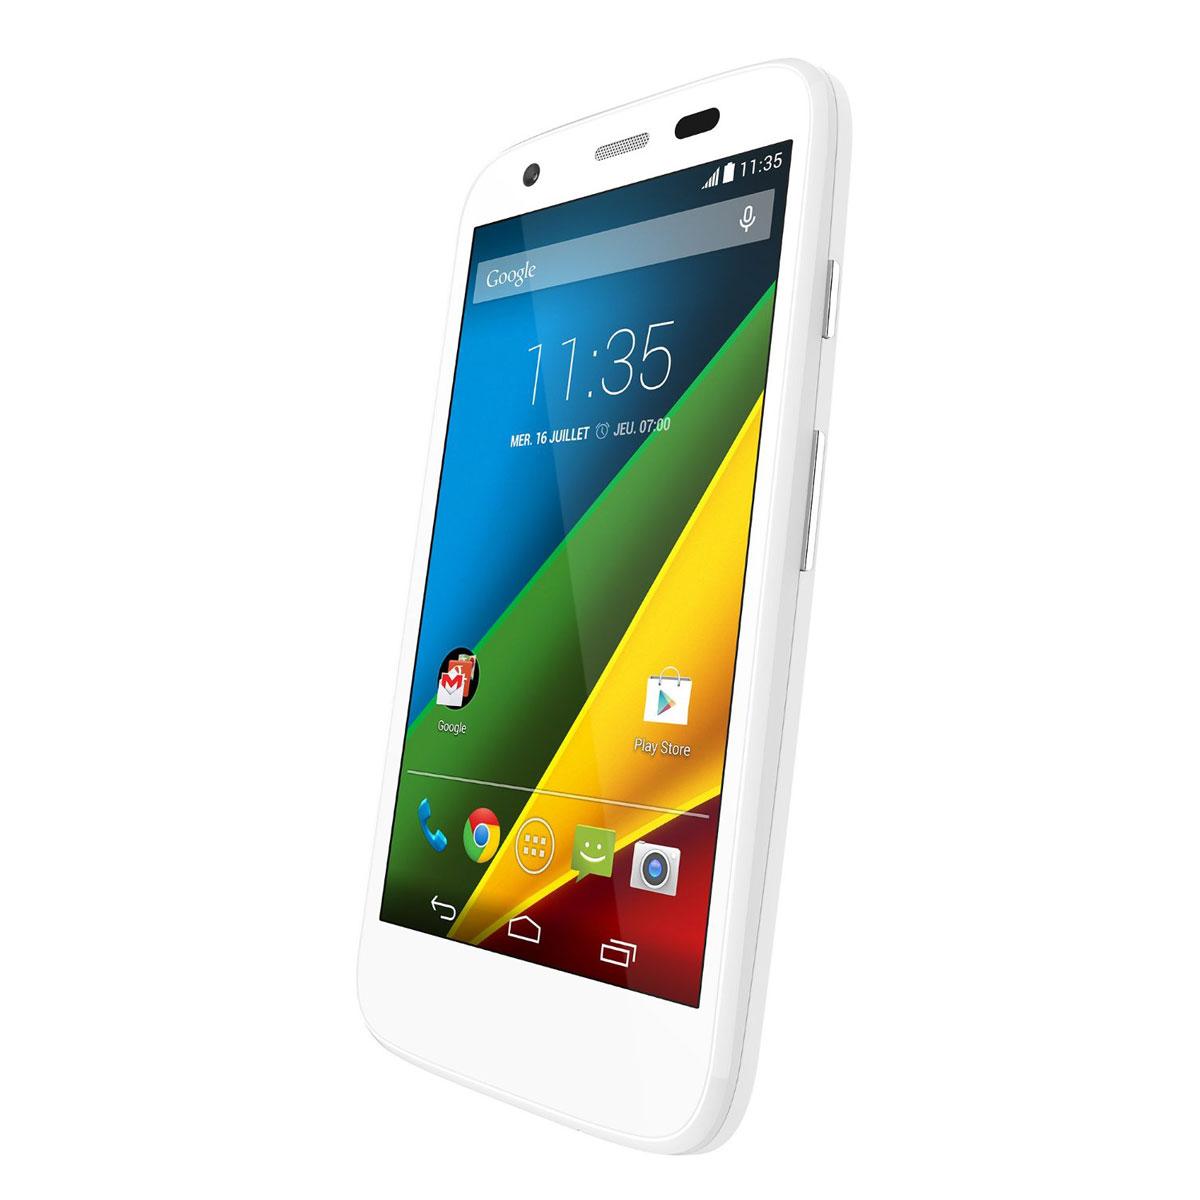 Motorola moto g 4g 8 go blanc mobile smartphone for Photo ecran moto g